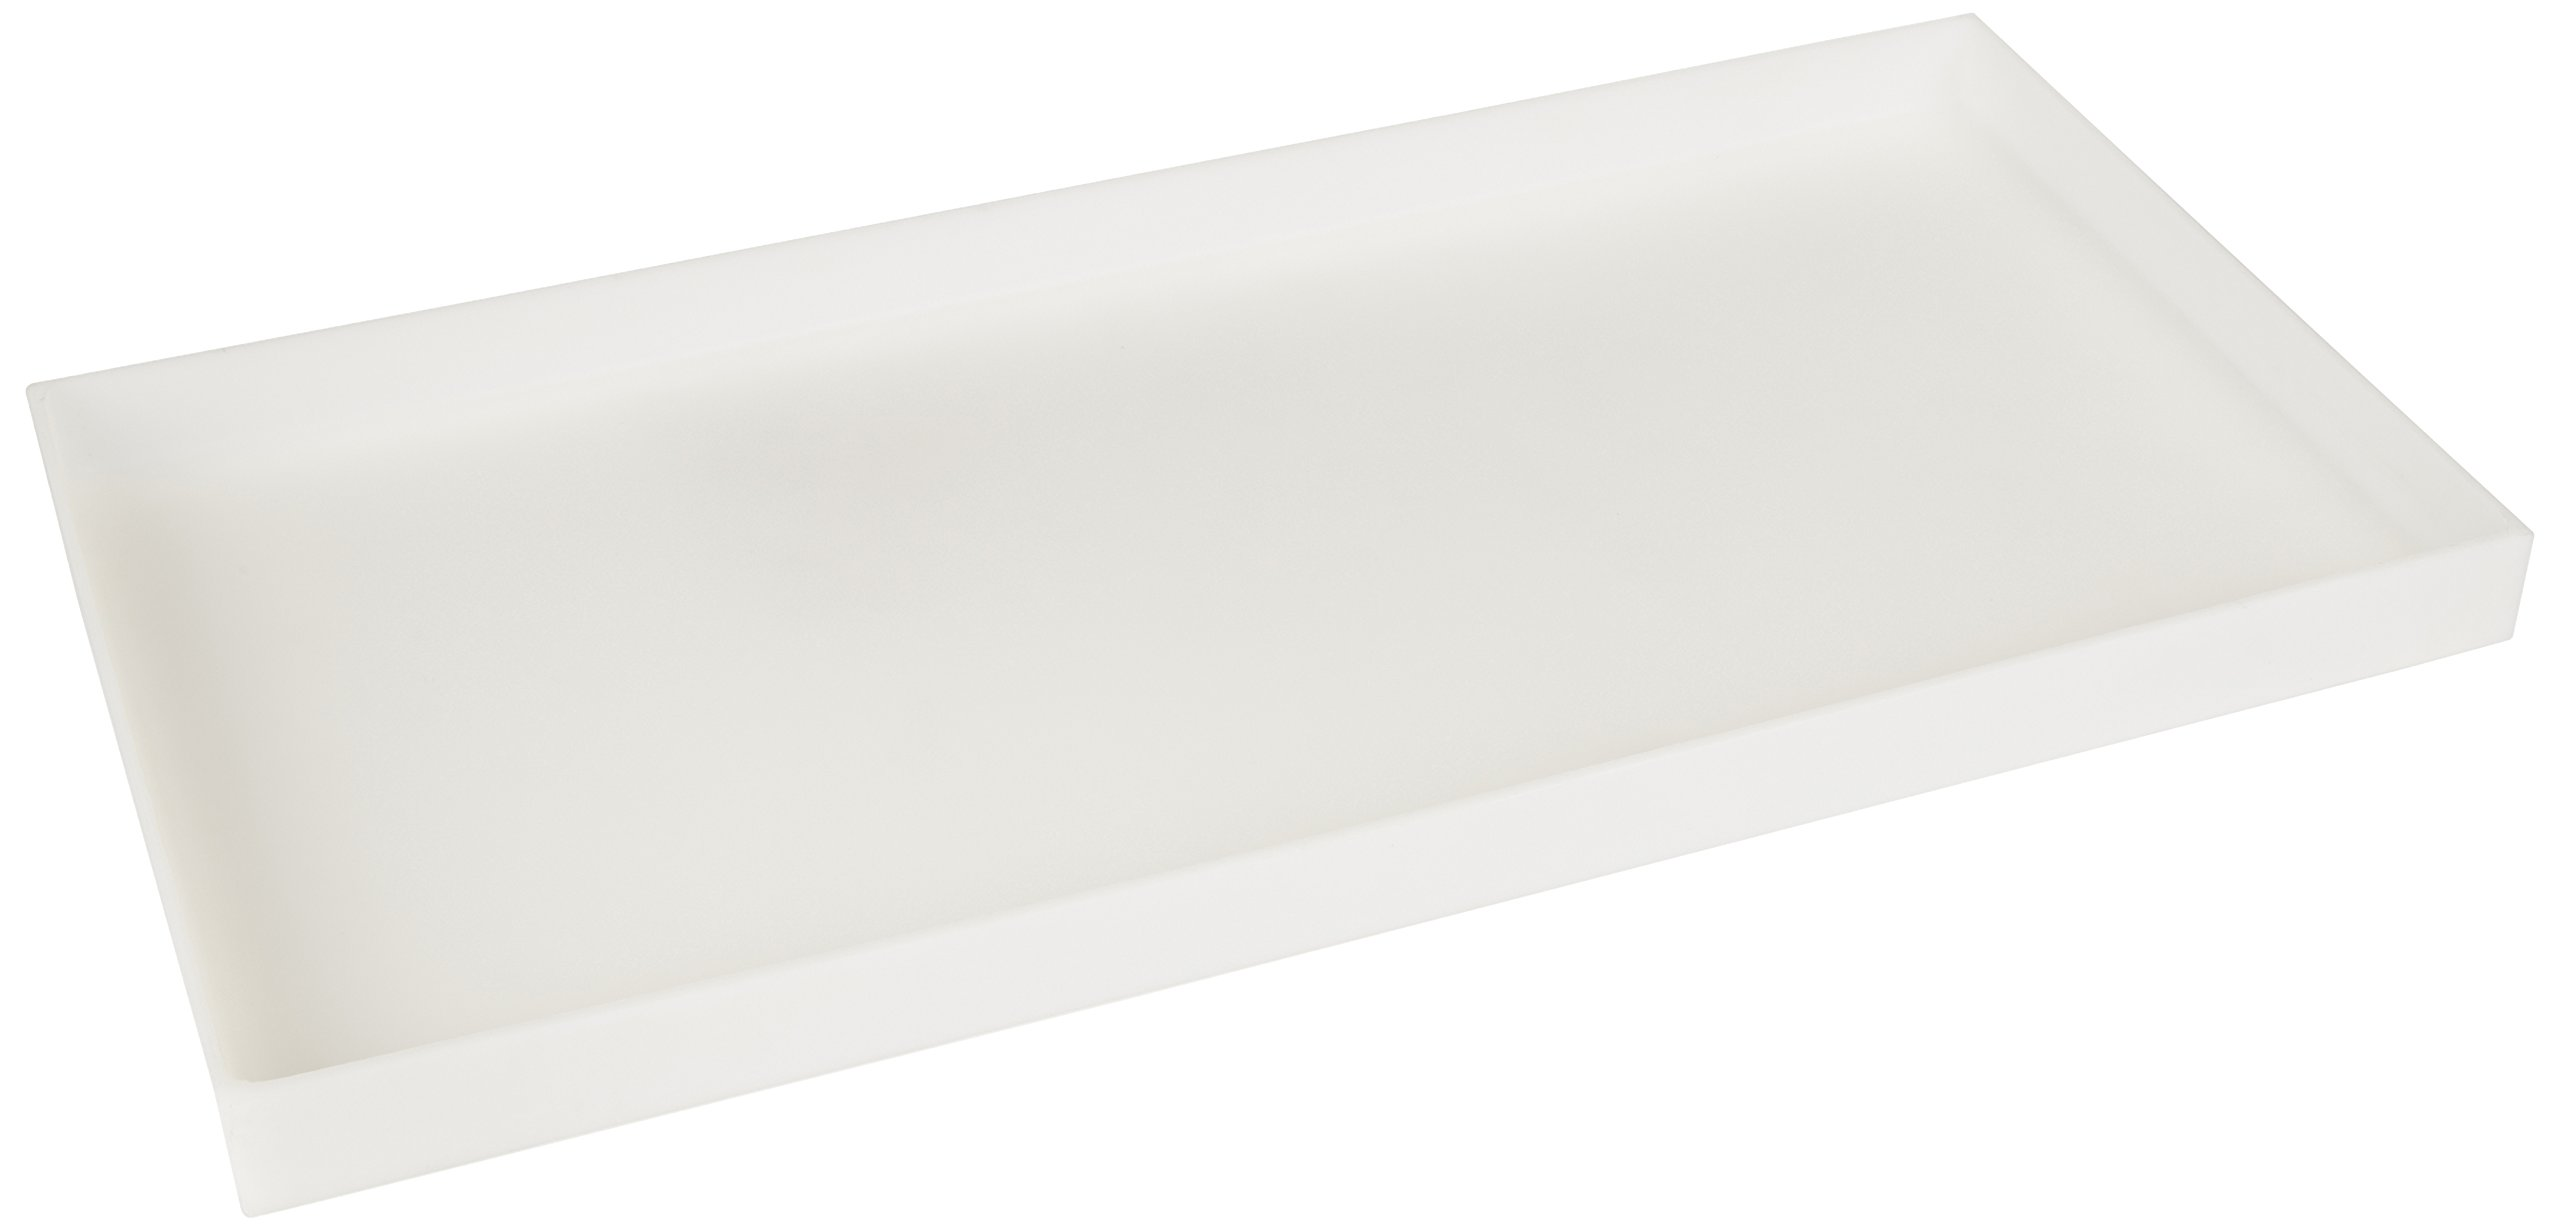 Scientific Plastics T523418-201 Spill Containment Tray, 2'' Side Wall, 18'' W x 34'' L